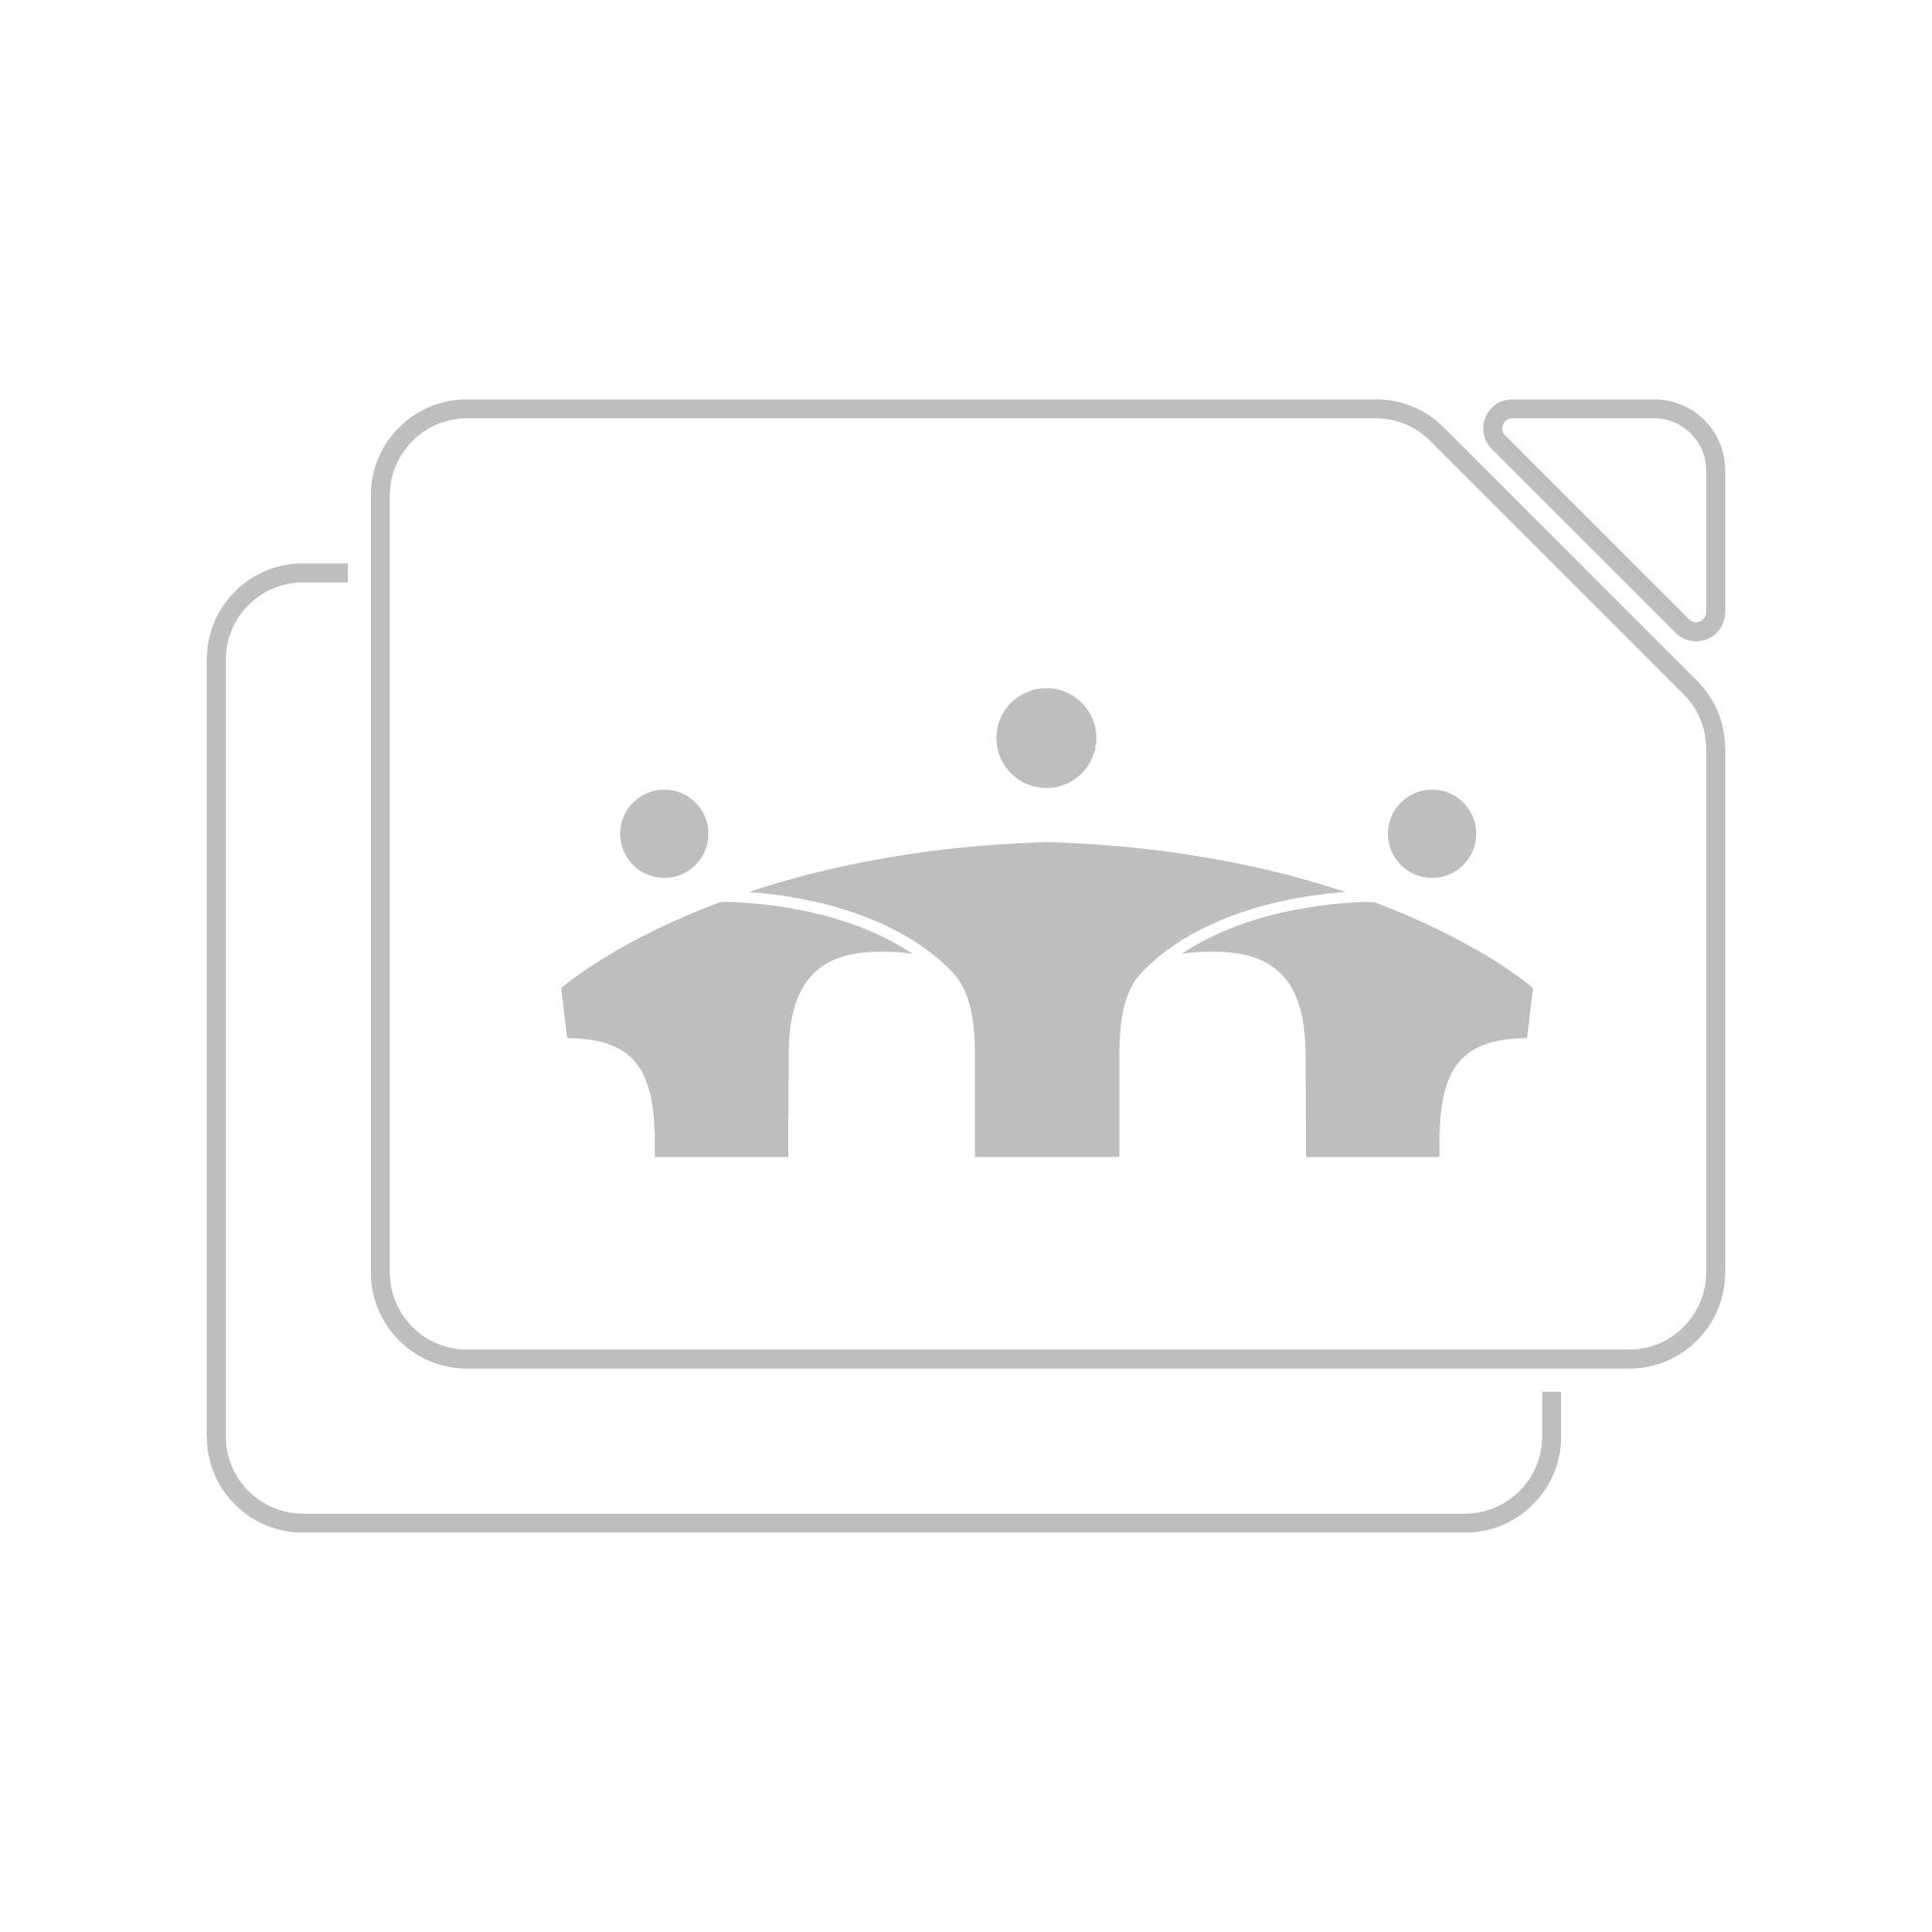 Logitech K380 for Mac Multi-Device Bluetooth Keyboard - ROSE - US INT'L - INTNL